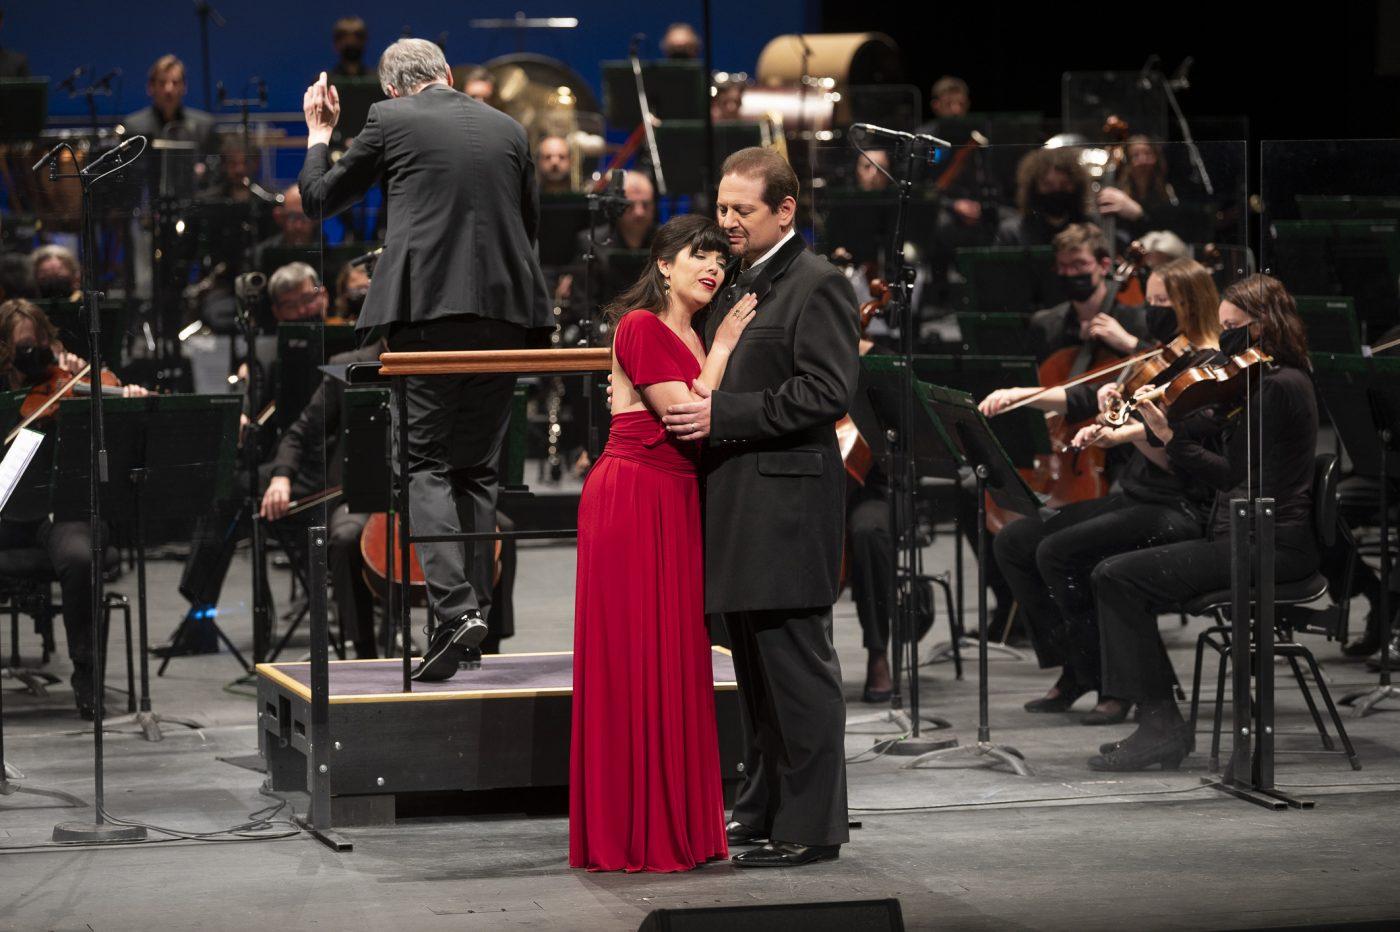 Opéra Royal de Wallonie-Liège, Orchestra de Hamlet and French Romanticism, chosen pieces